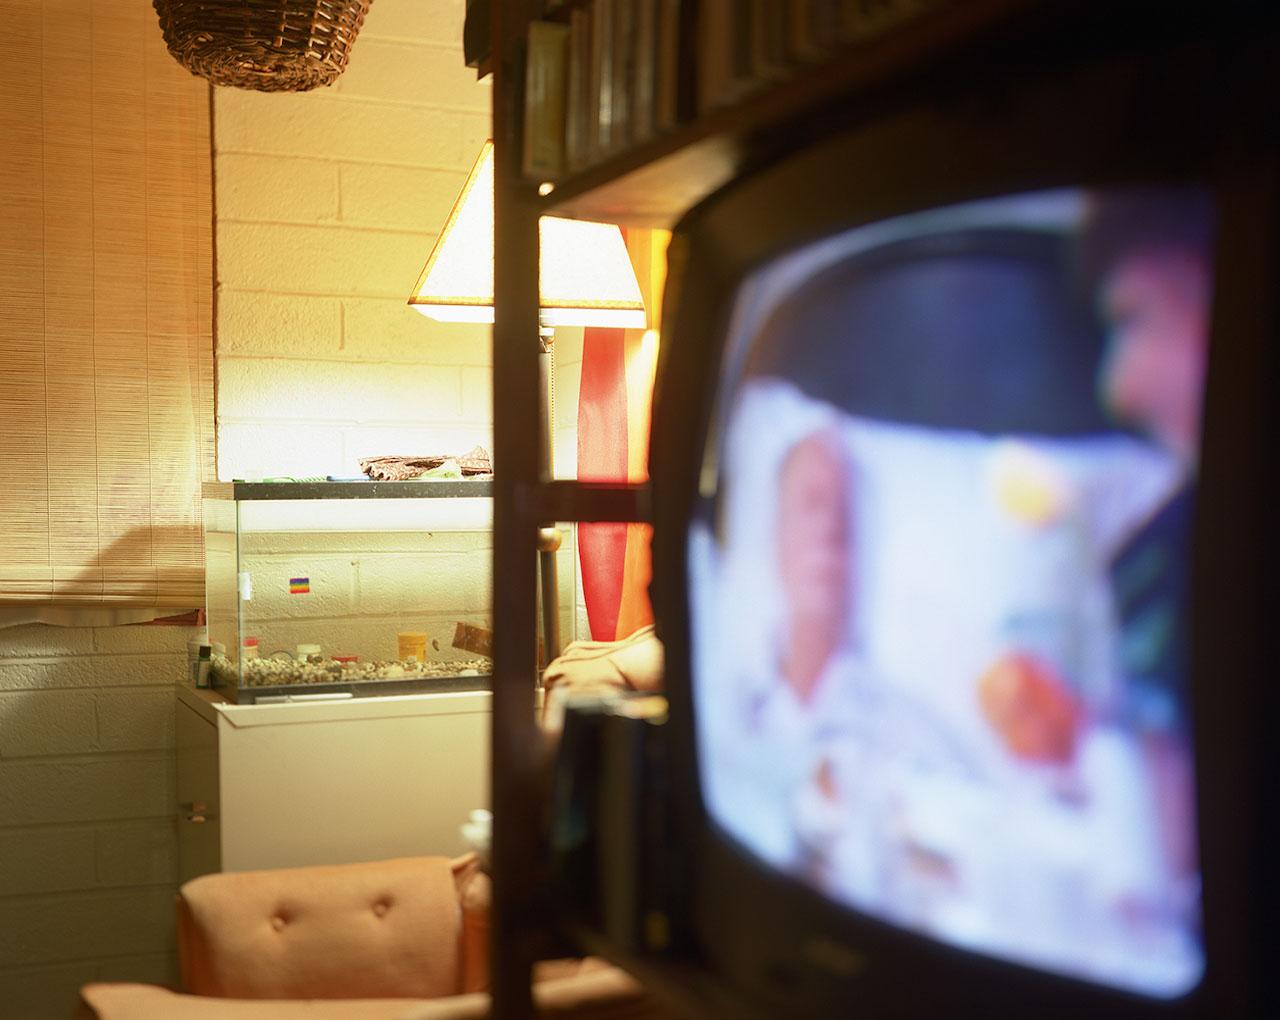 Chris' TV